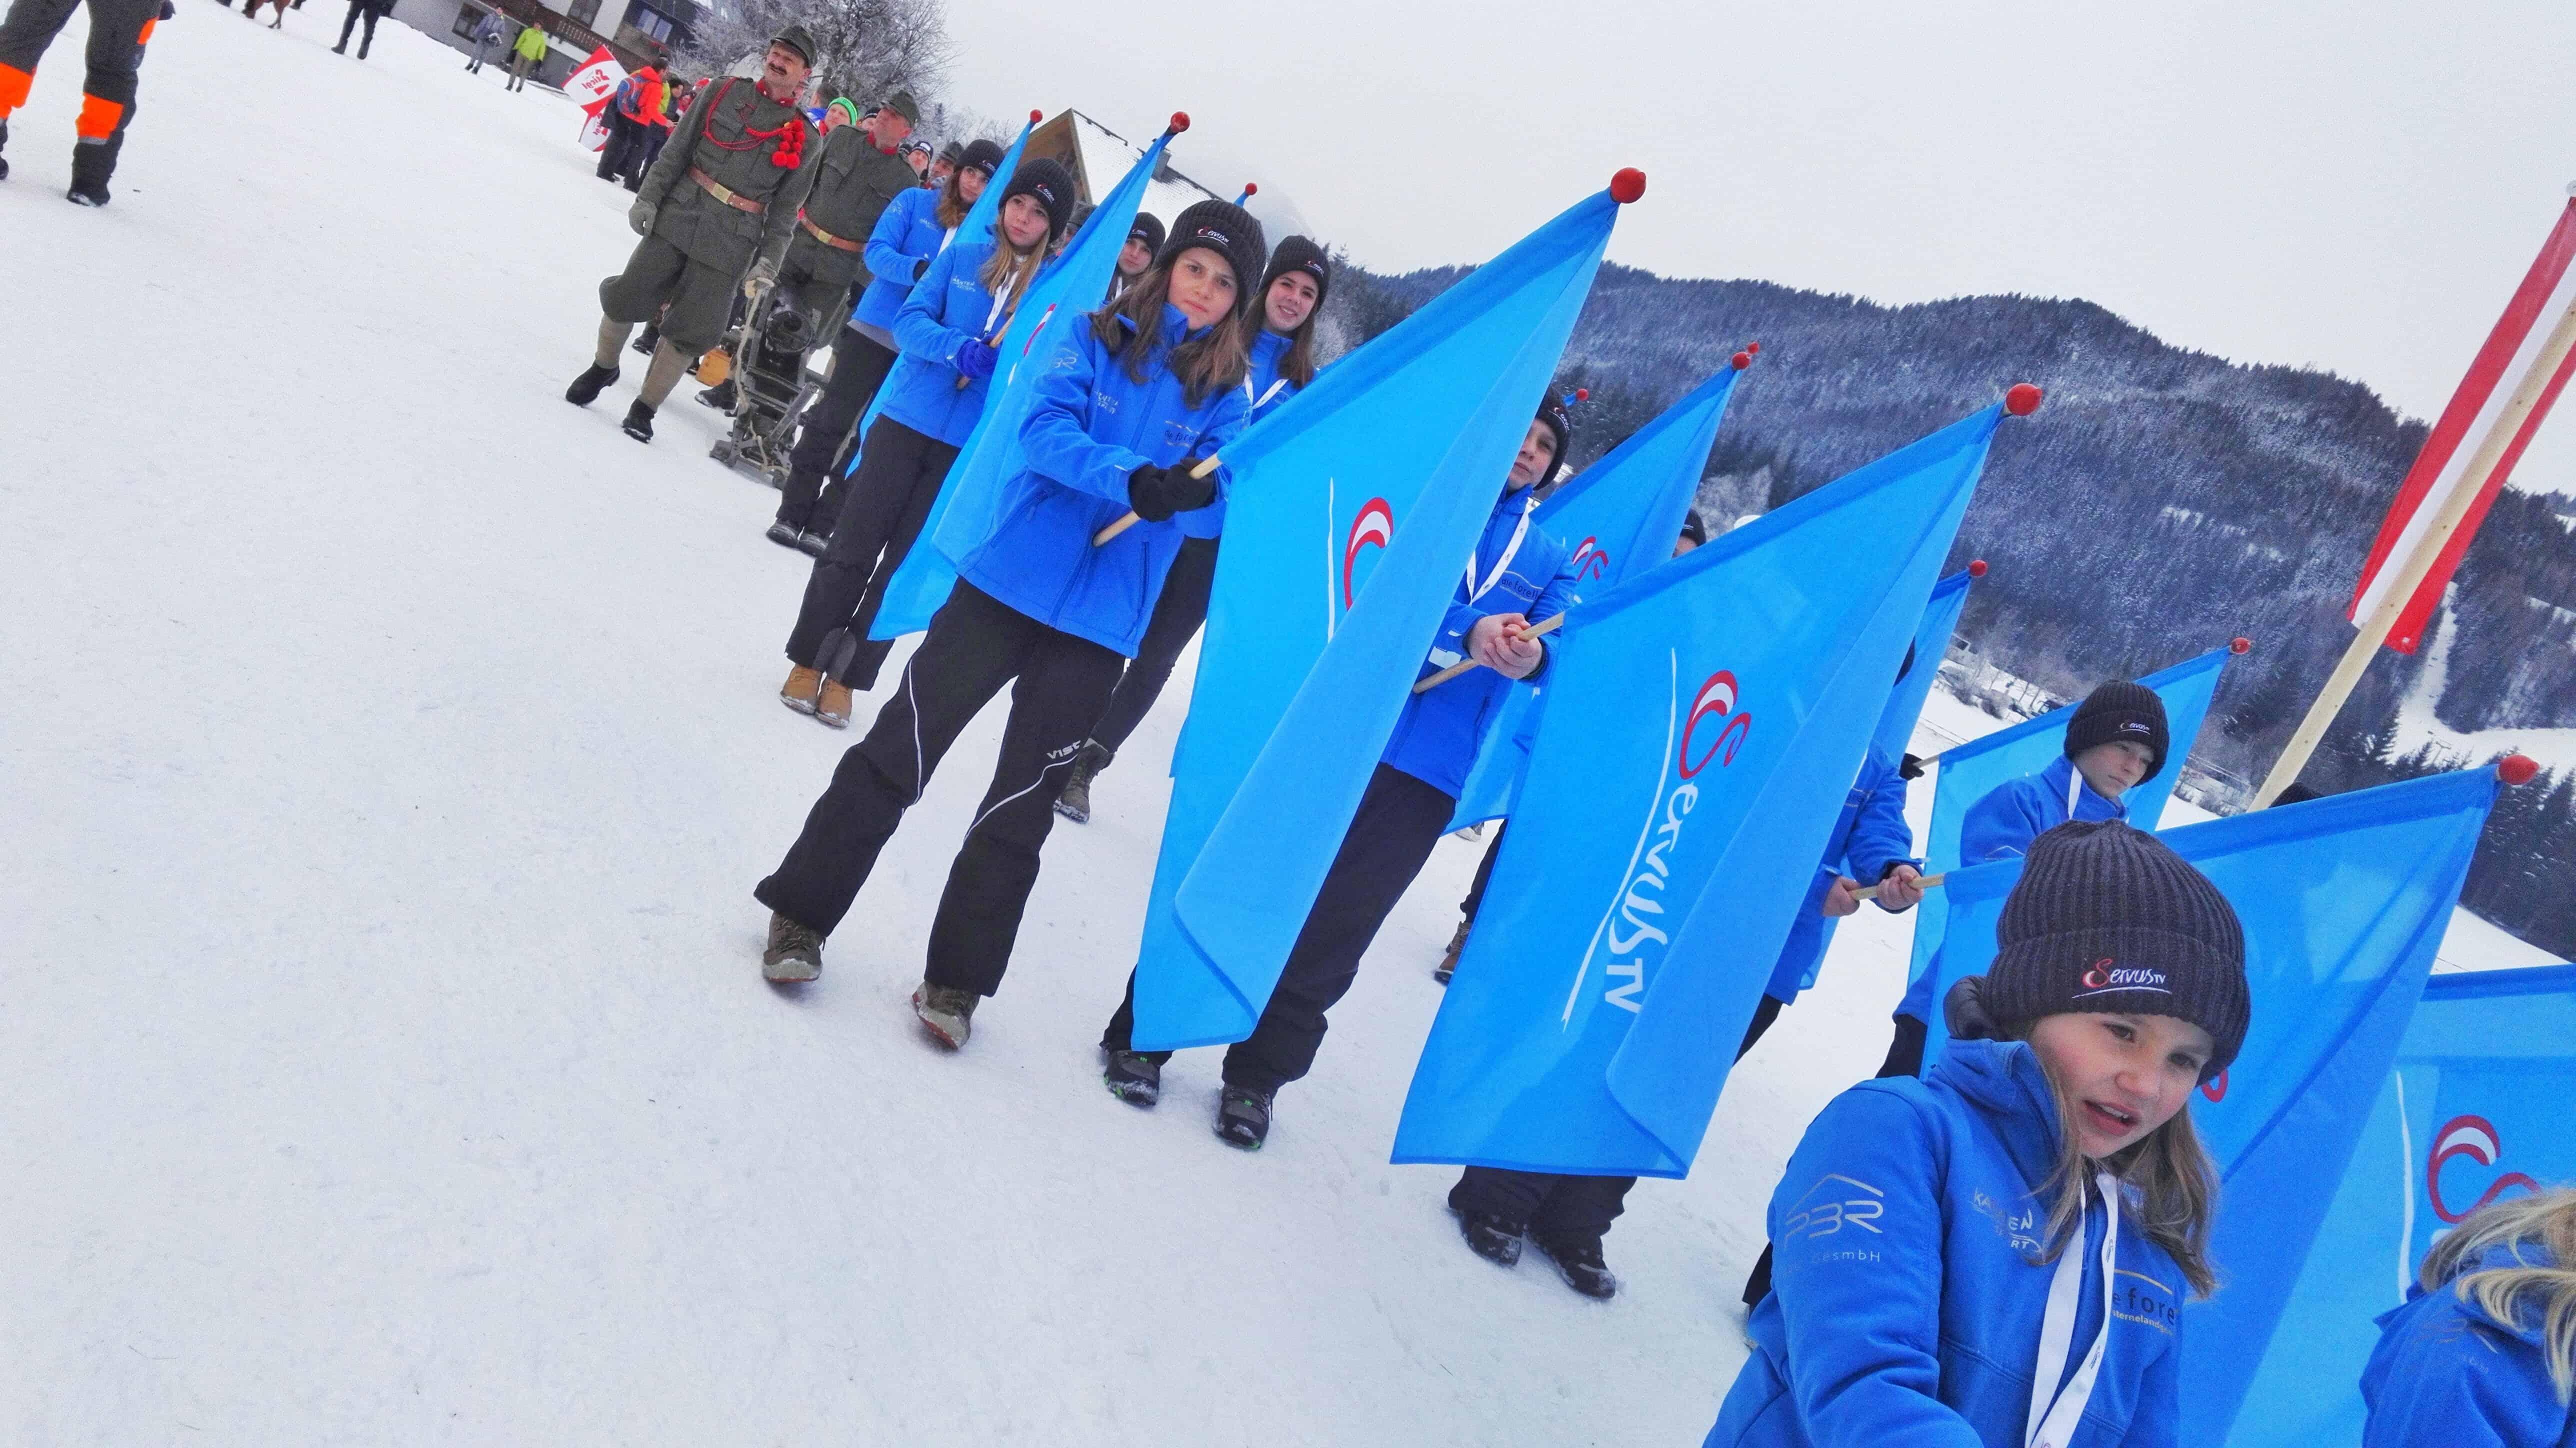 alpenpokal 13 - Servus Alpenpokal